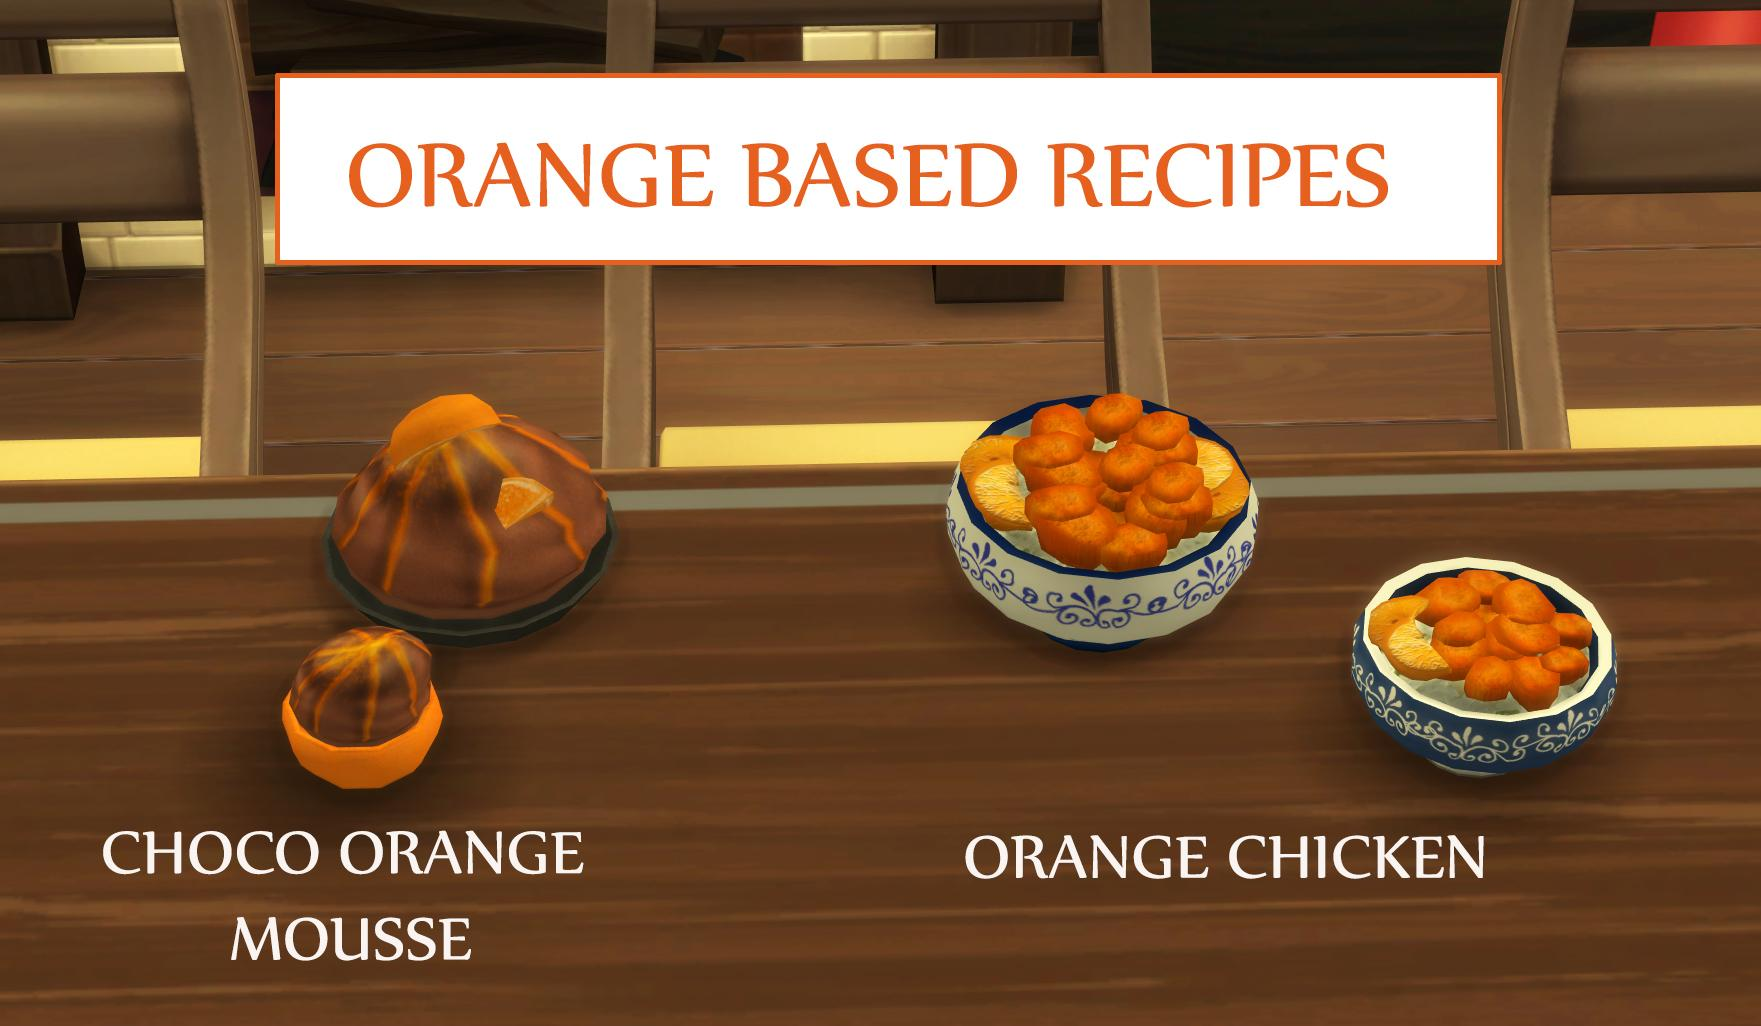 Orange Based Recipes - Orange chicken and Orange Mousse (Update - 14.12.2019)